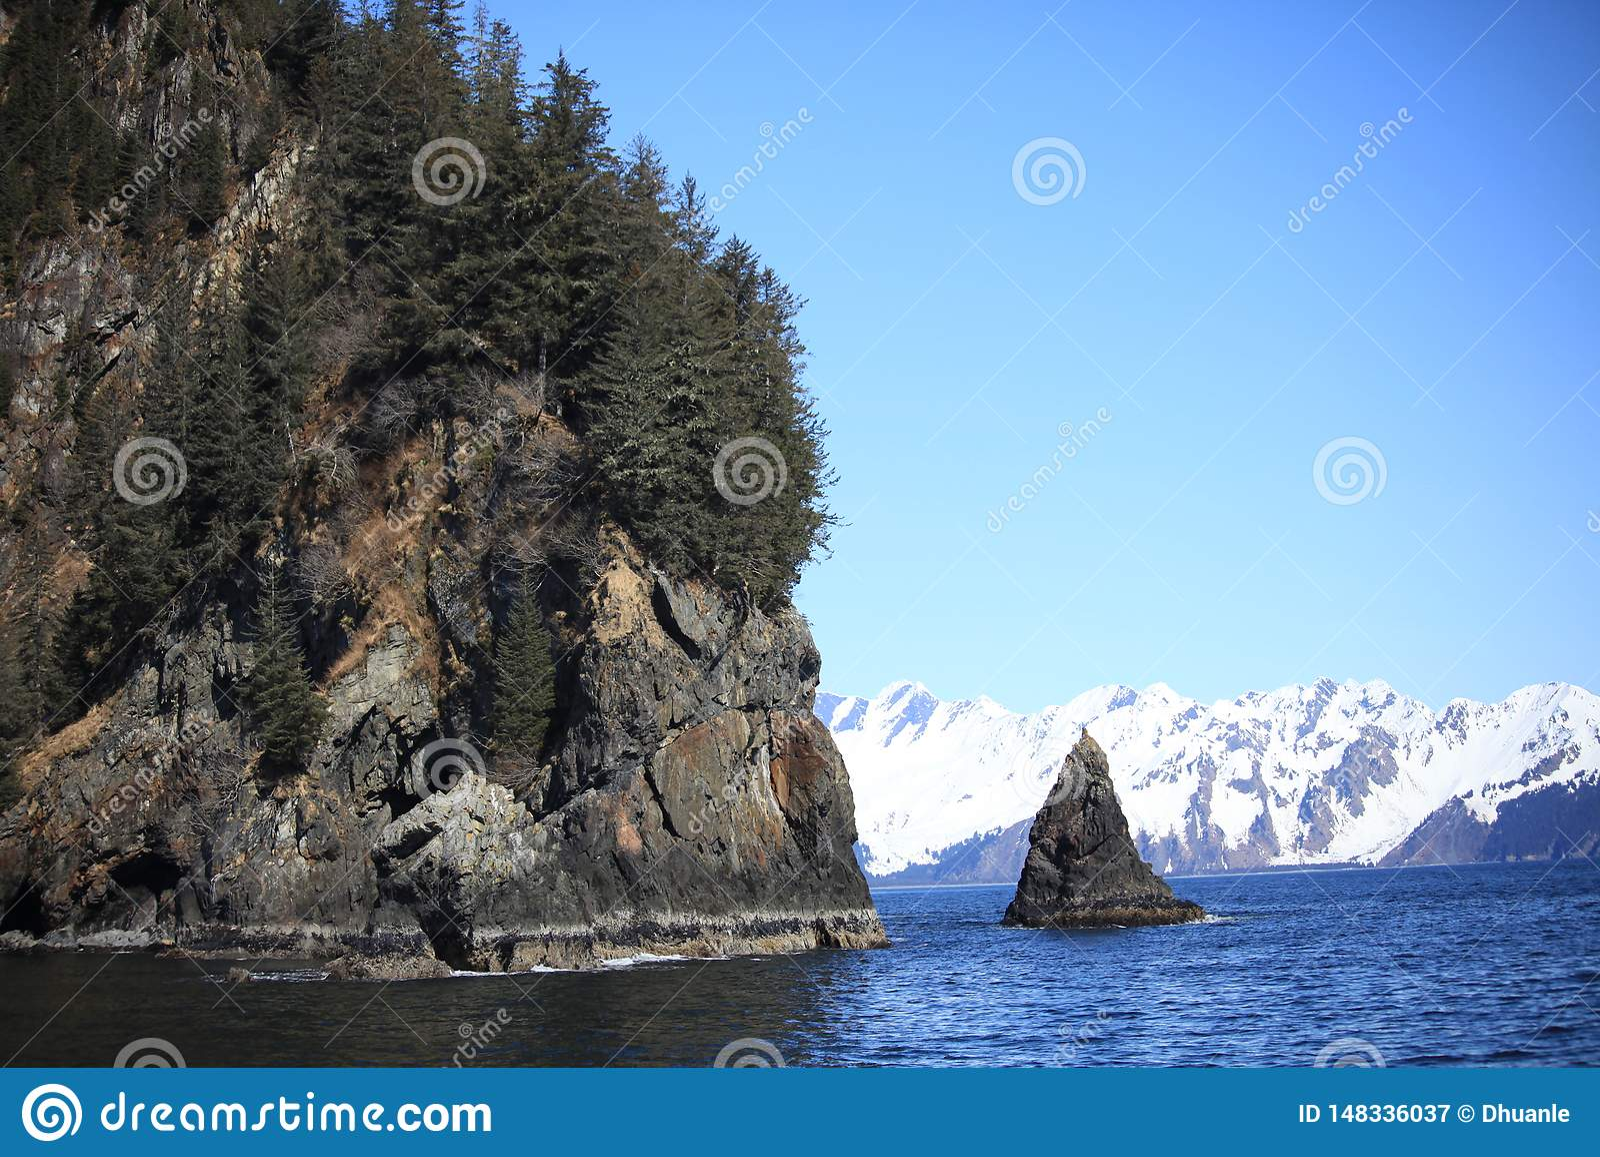 Montagne, mer, neige, roche